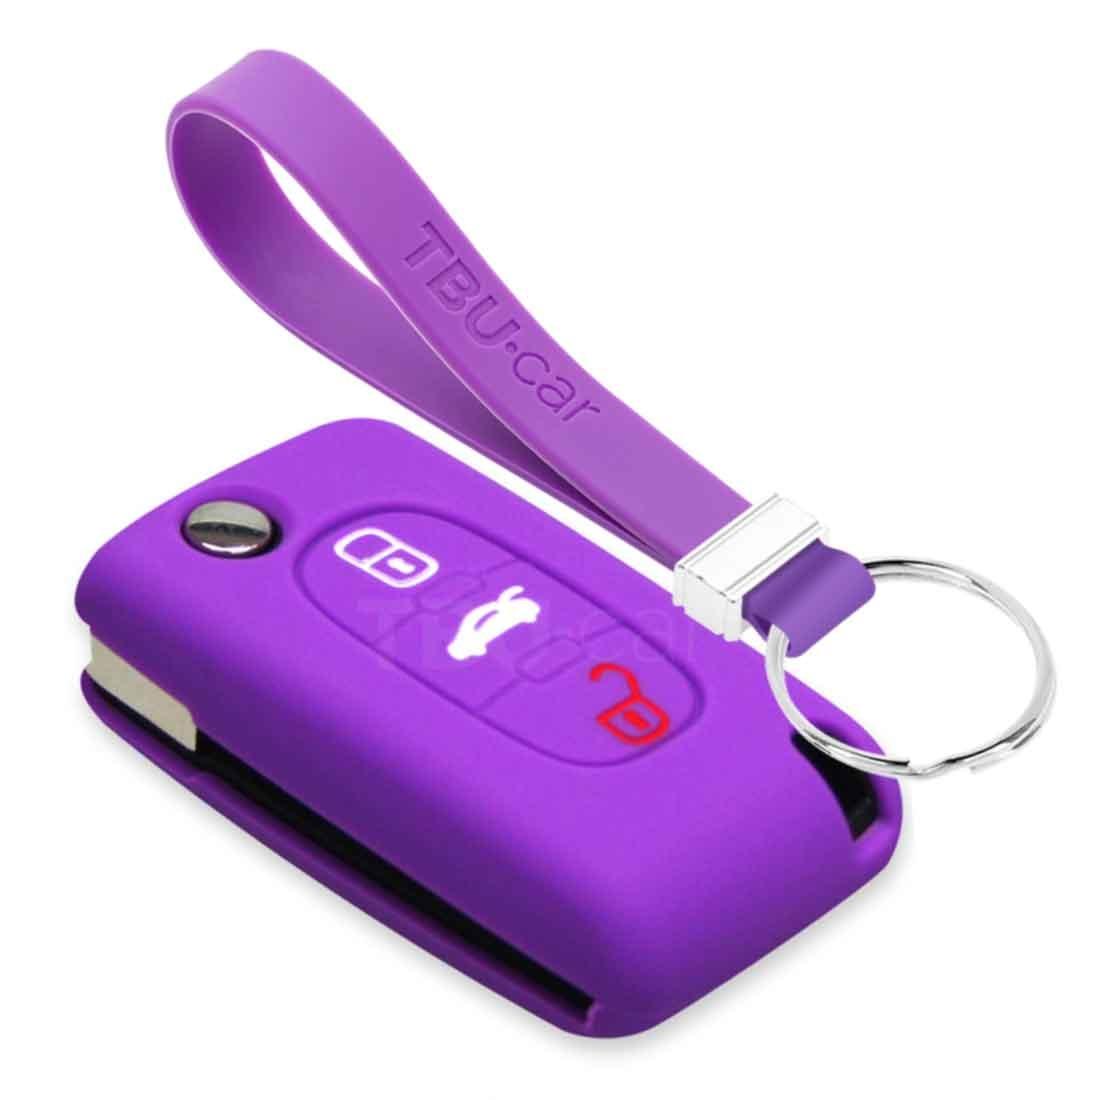 TBU car TBU car Autoschlüssel Hülle kompatibel mit Citroën 3 Tasten - Schutzhülle aus Silikon - Auto Schlüsselhülle Cover in Violett